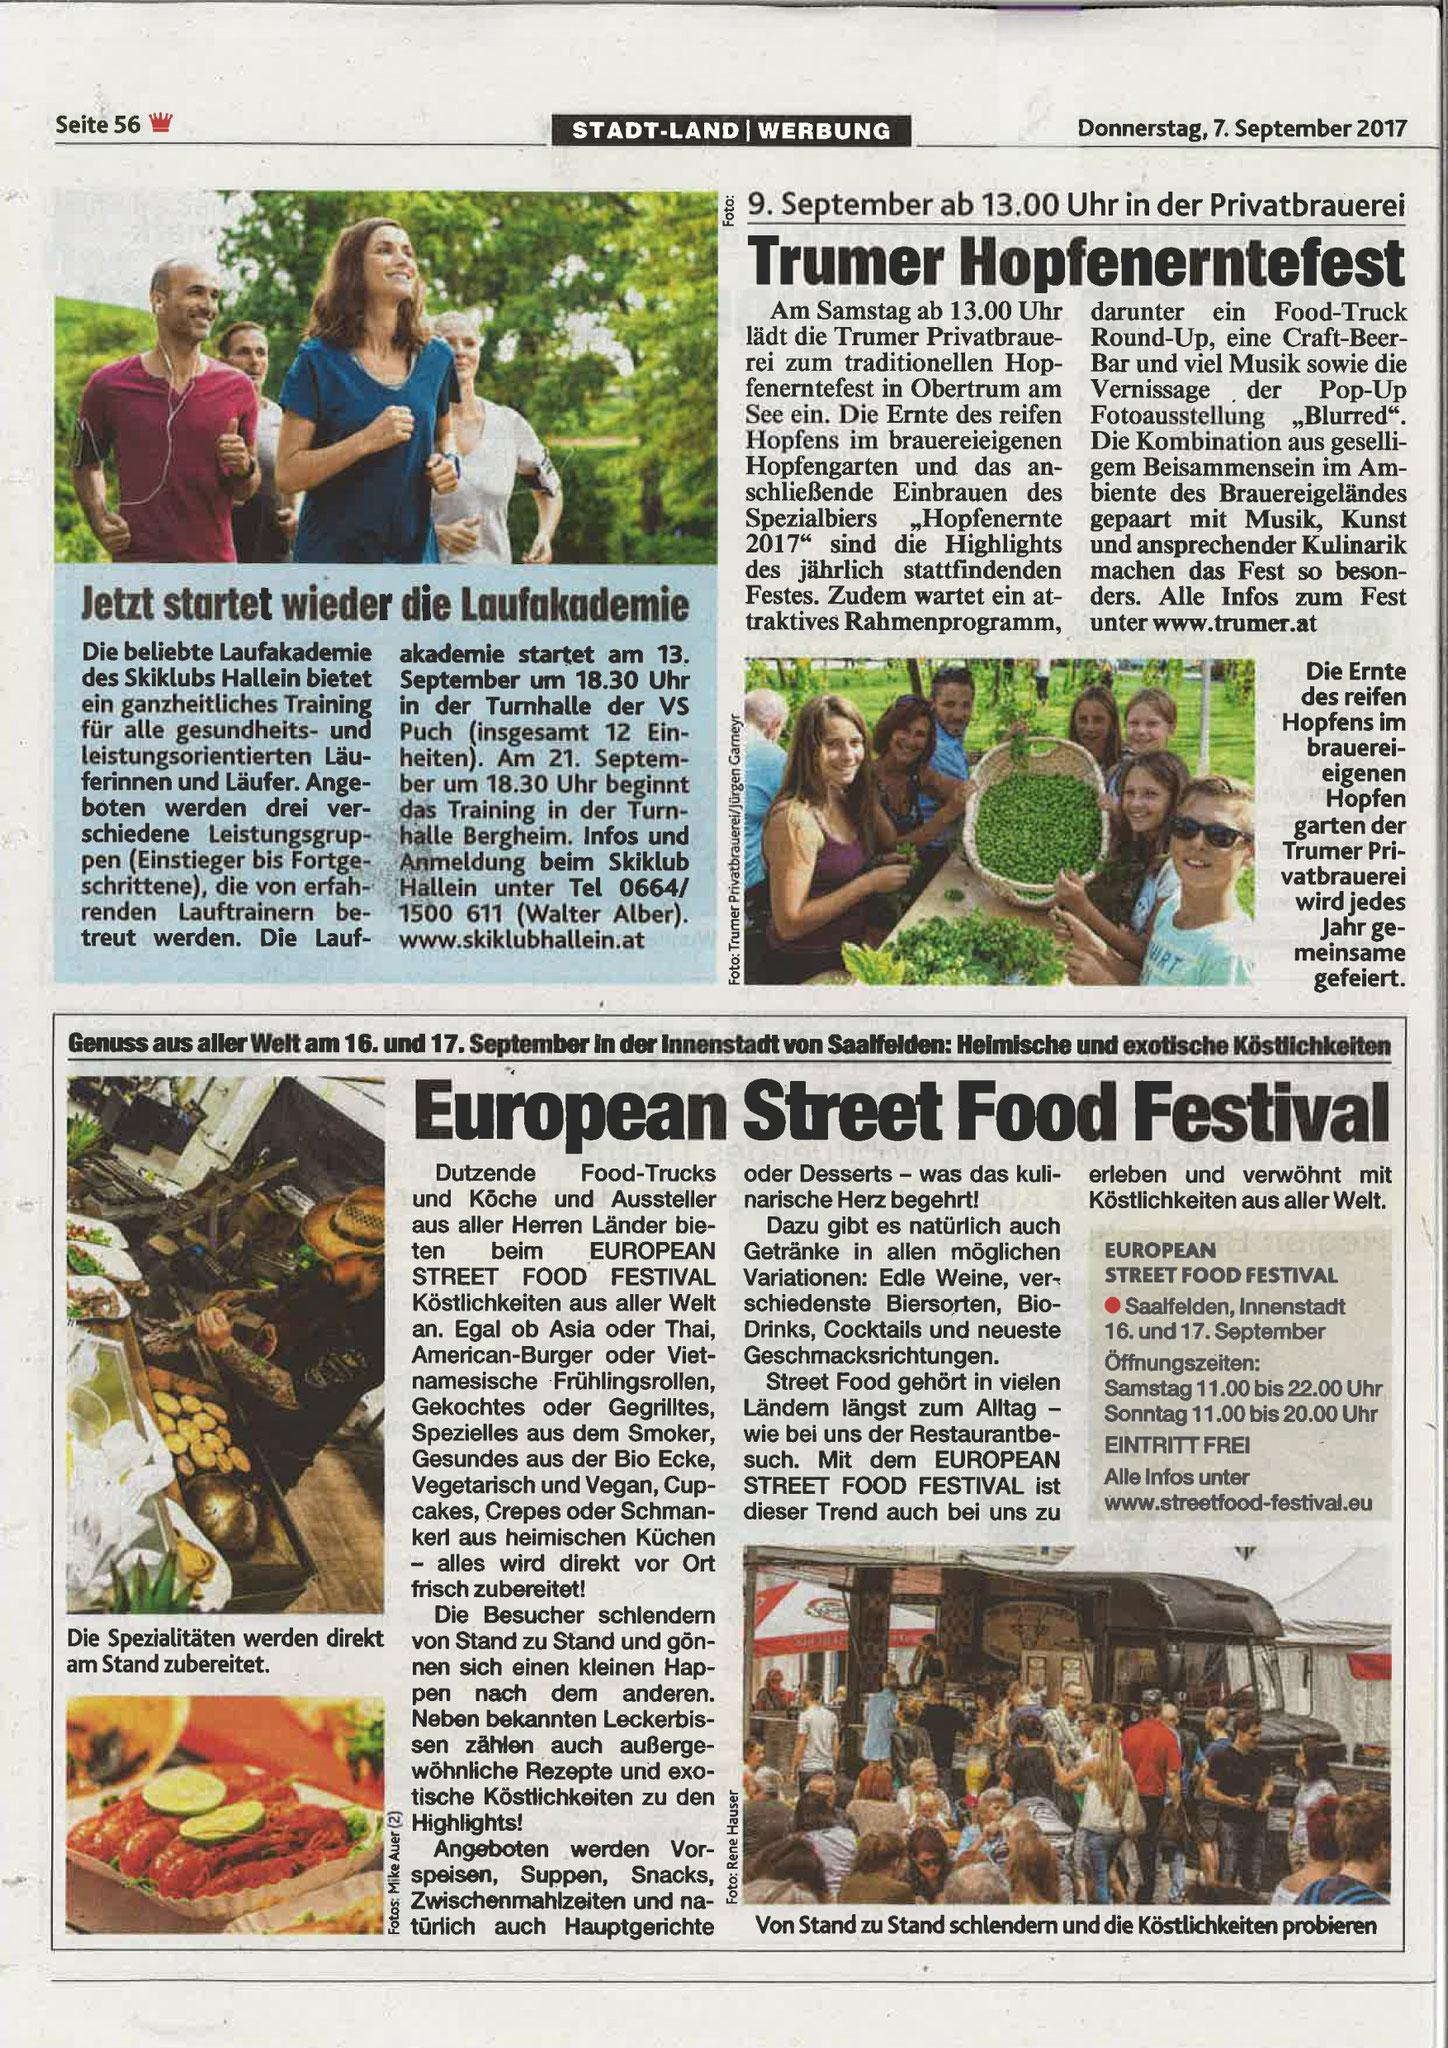 Kronen Zeitung, 7. September 2017